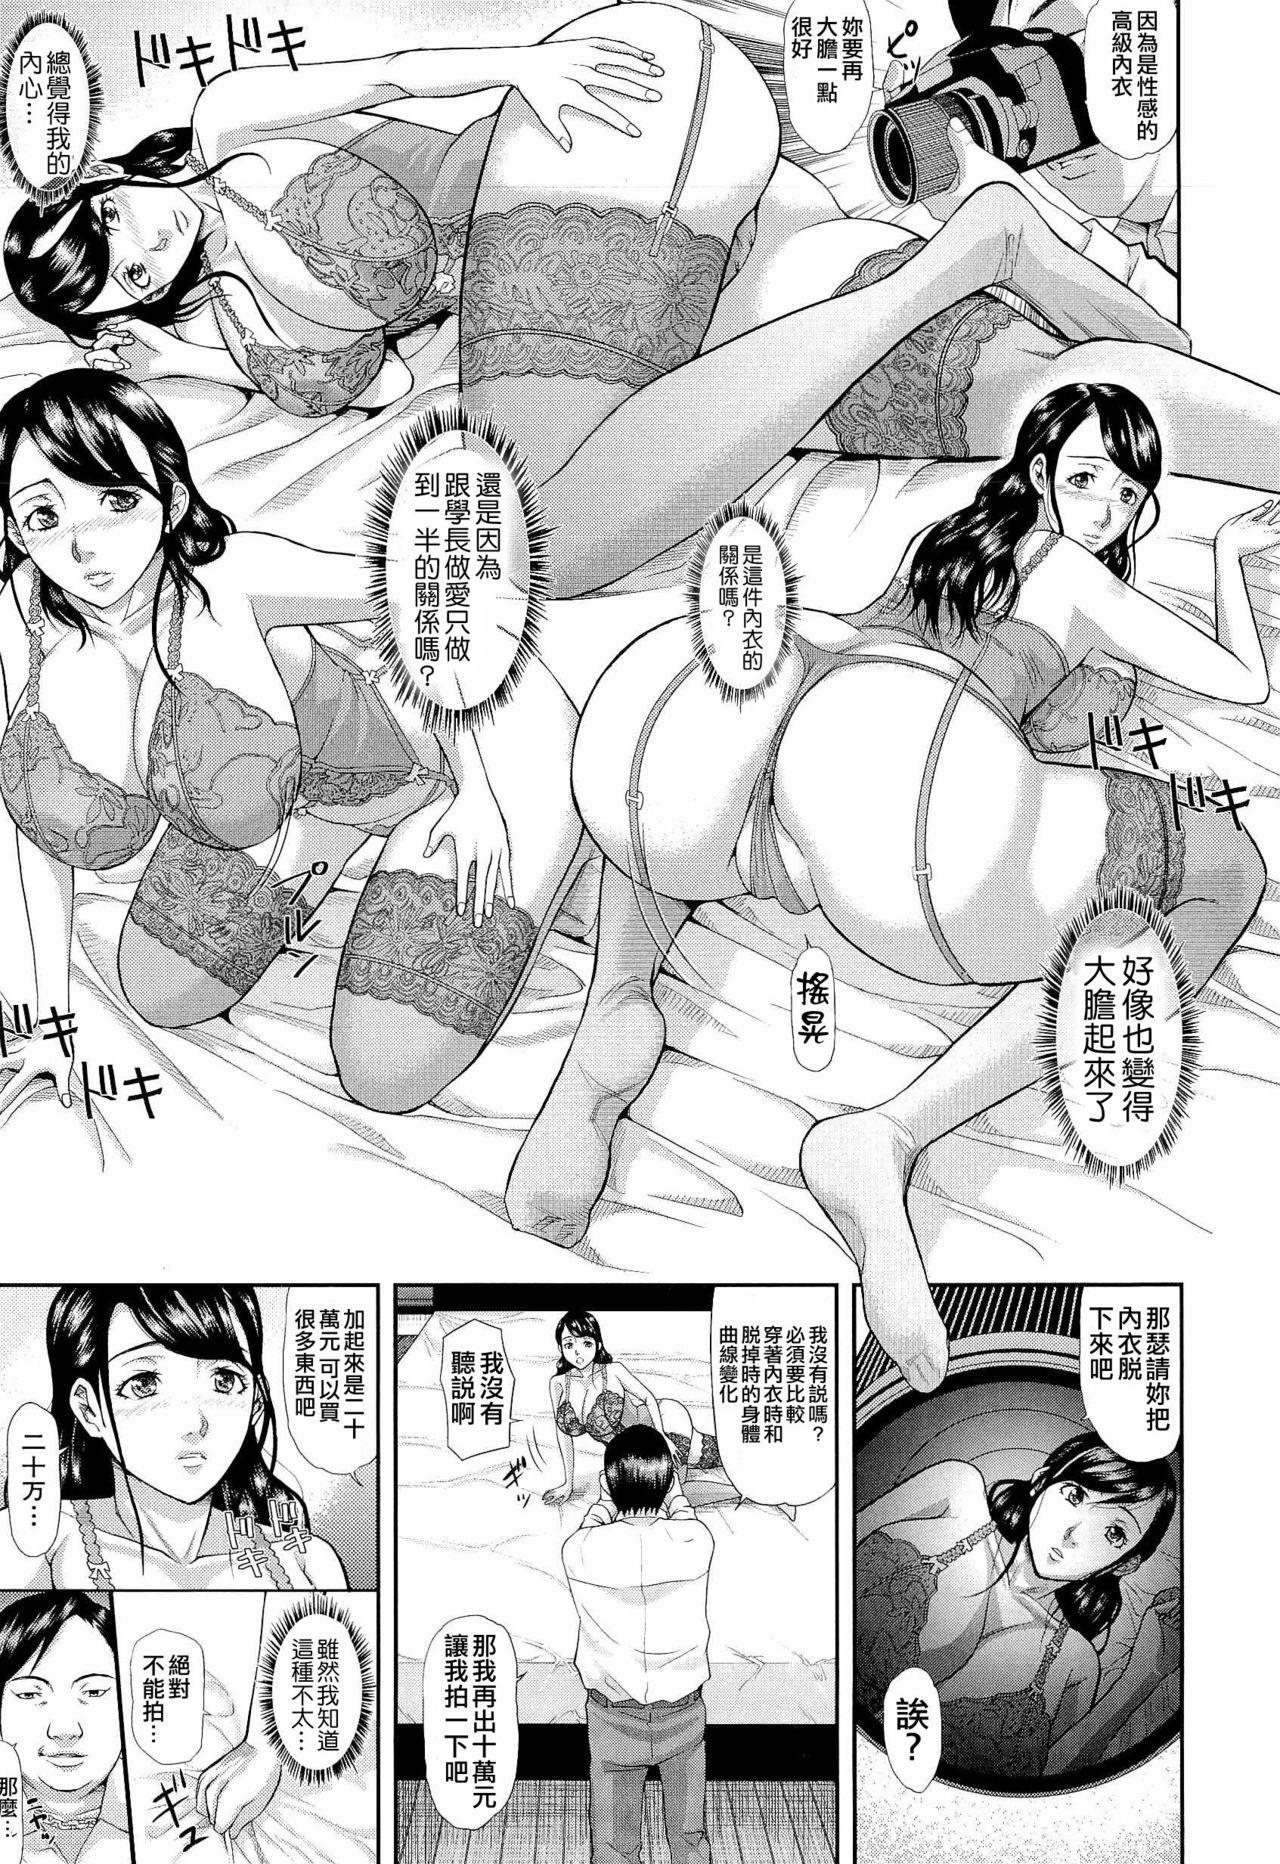 [Honebuto Danshaku] Innou Kaizou Program ~Oyako Zecchou Cult Ochi~ [Chinese]【不想记名重嵌--高质量图源】 111